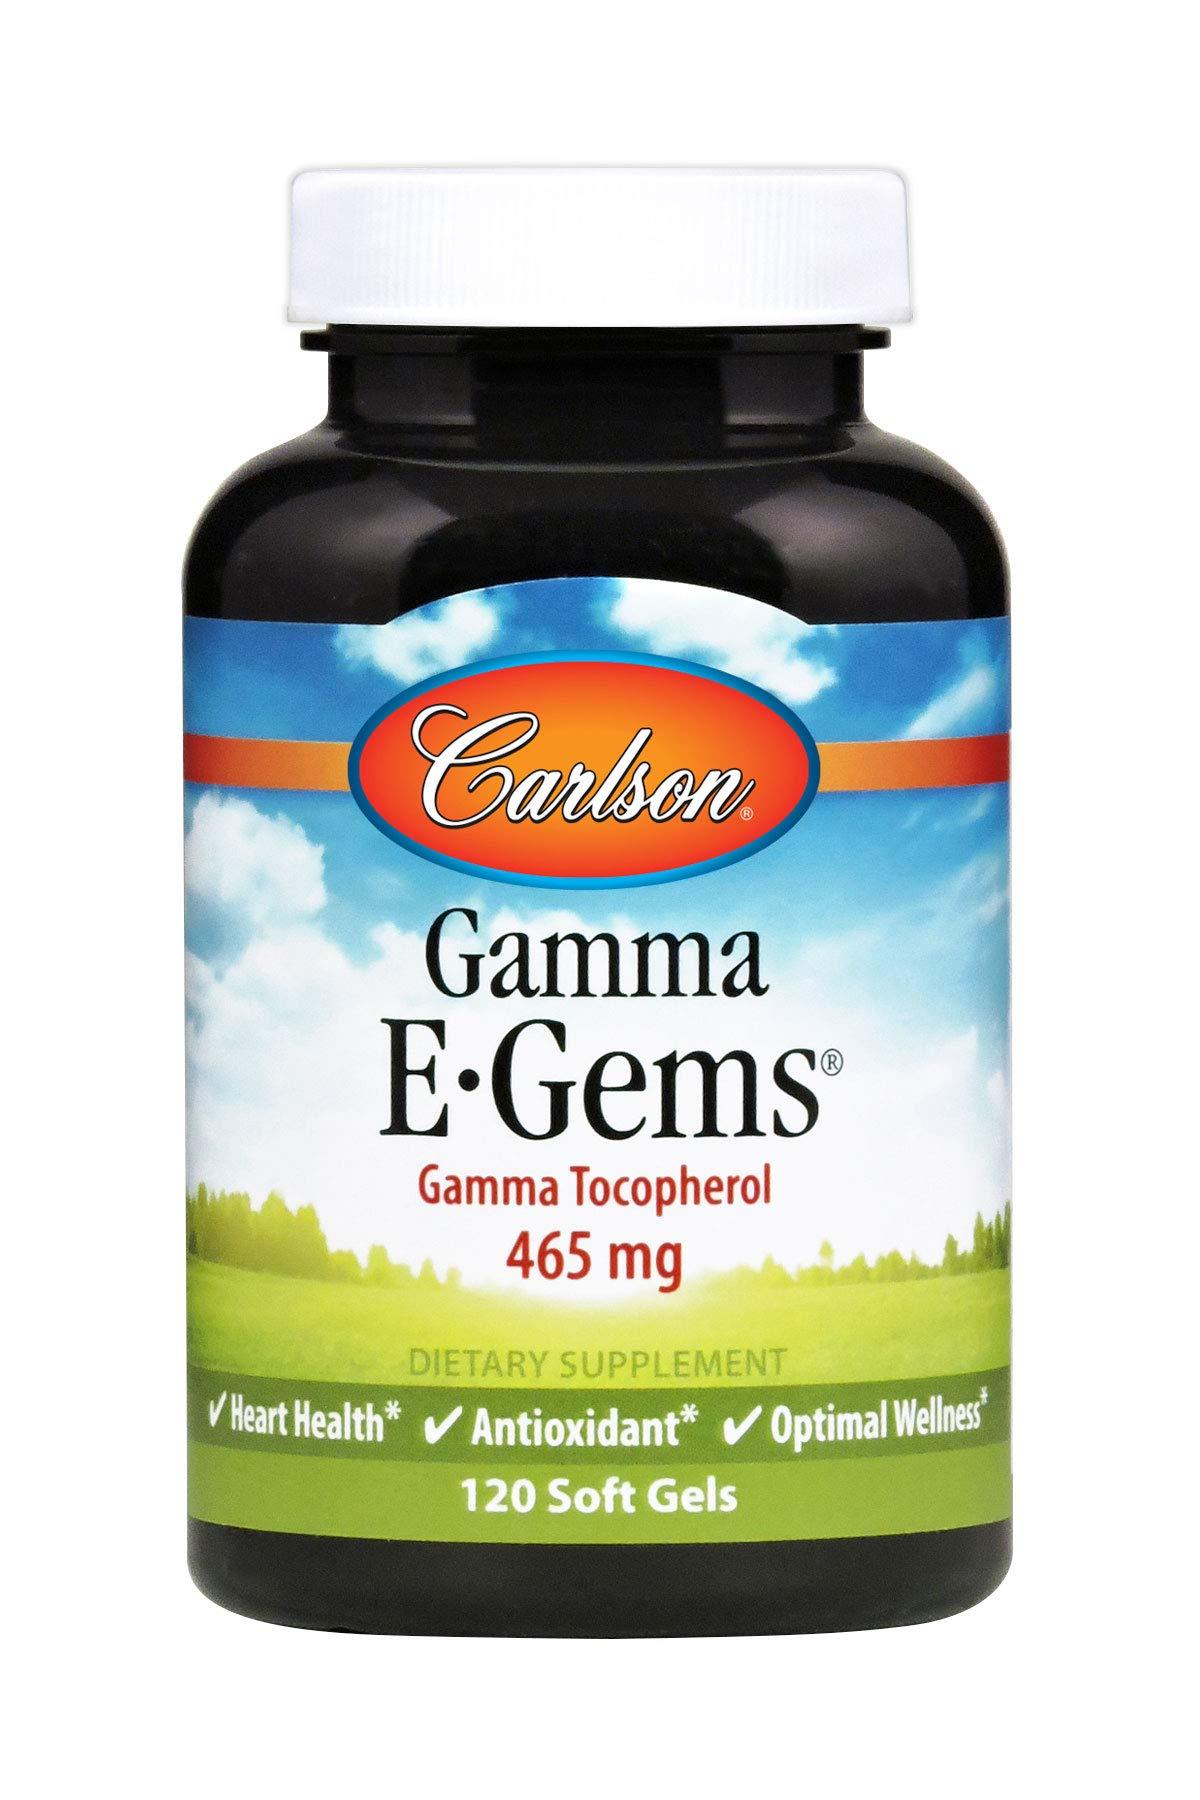 Carlson - Gamma E-Gems, Gamma Tocopherol 465 mg, Heart Health & Optimal Wellness, Antioxidant, 120 Soft gels